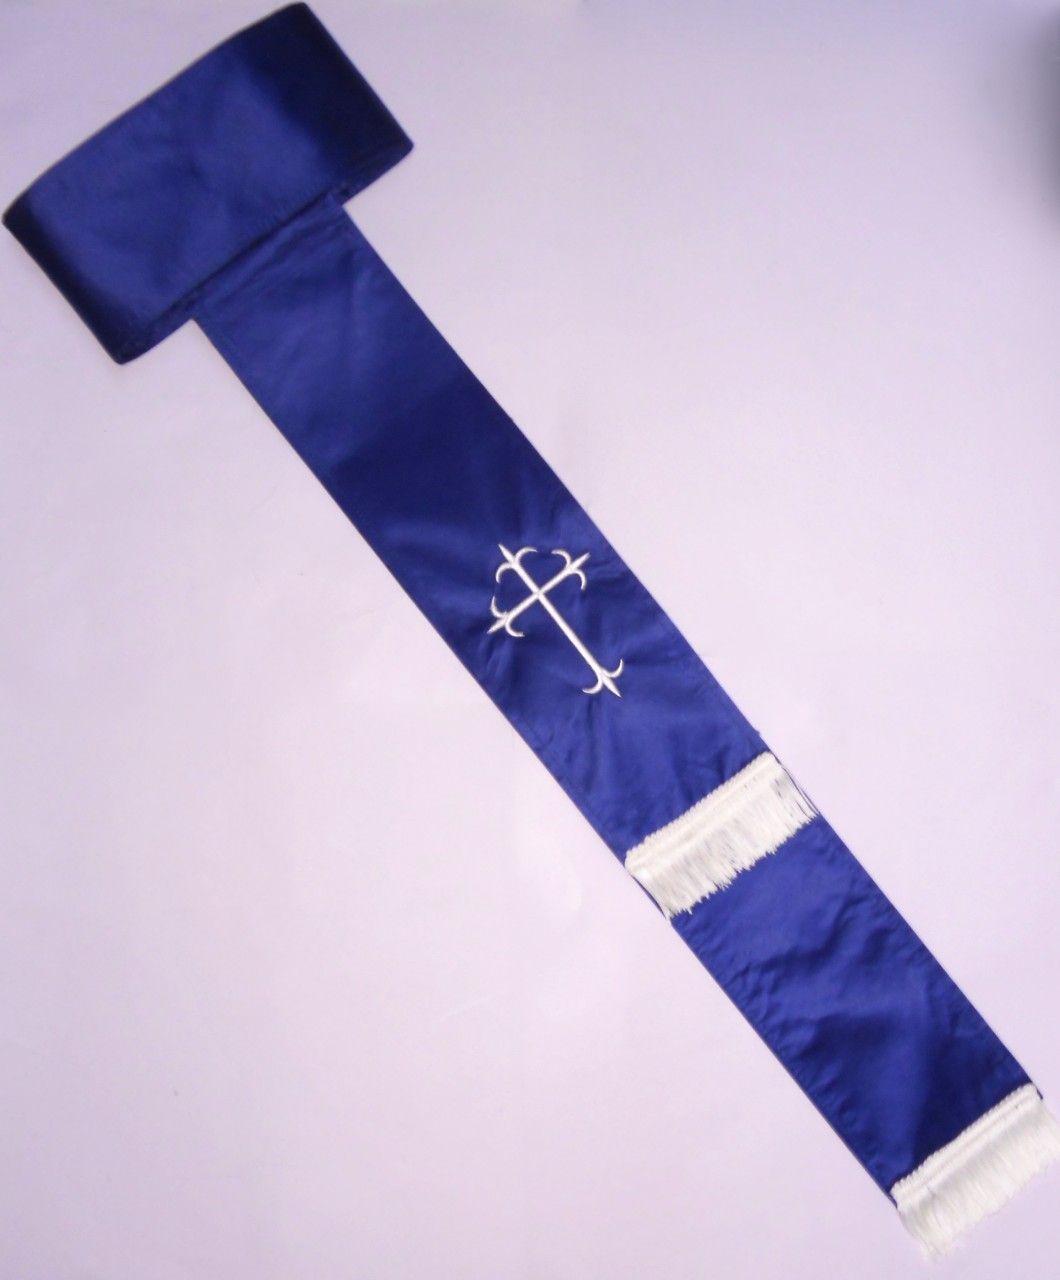 Band Cincture Belt - Royal/Creme Cross